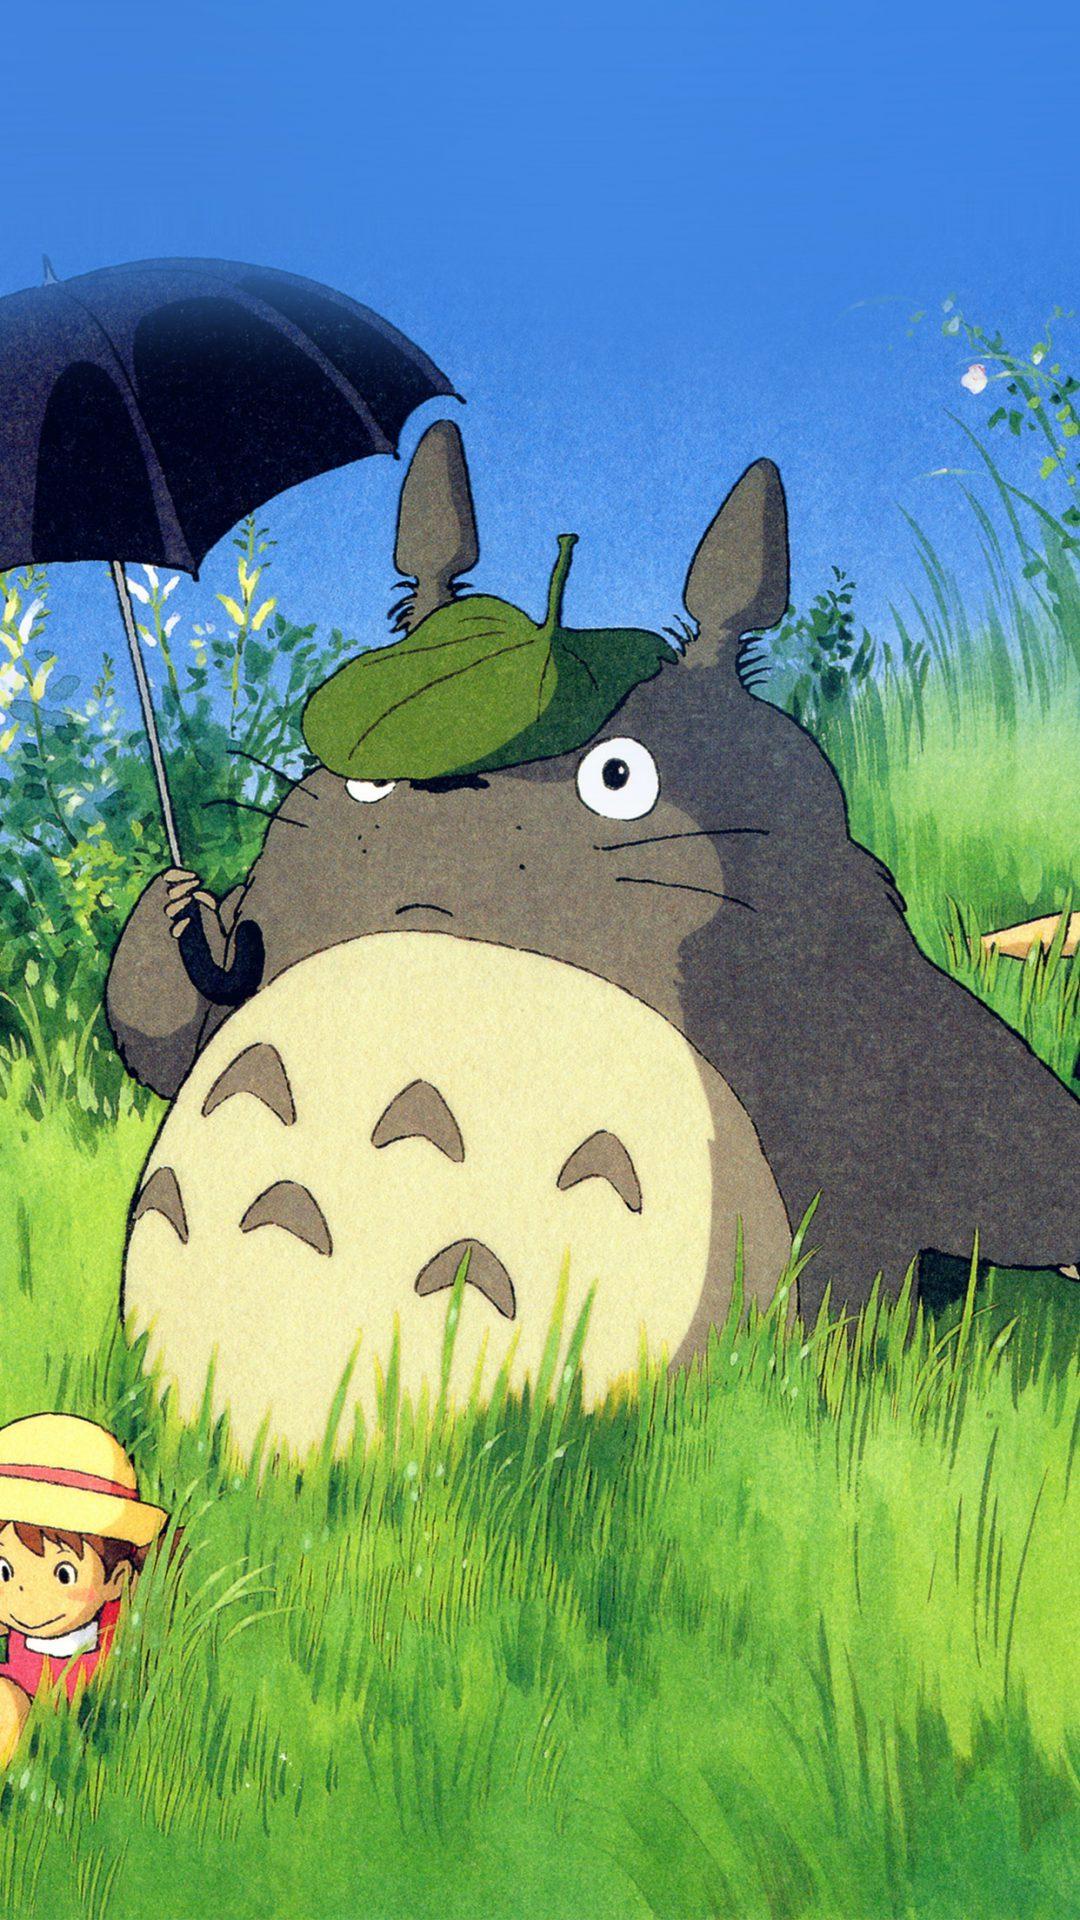 Totoro Art Cute Anime Illustration